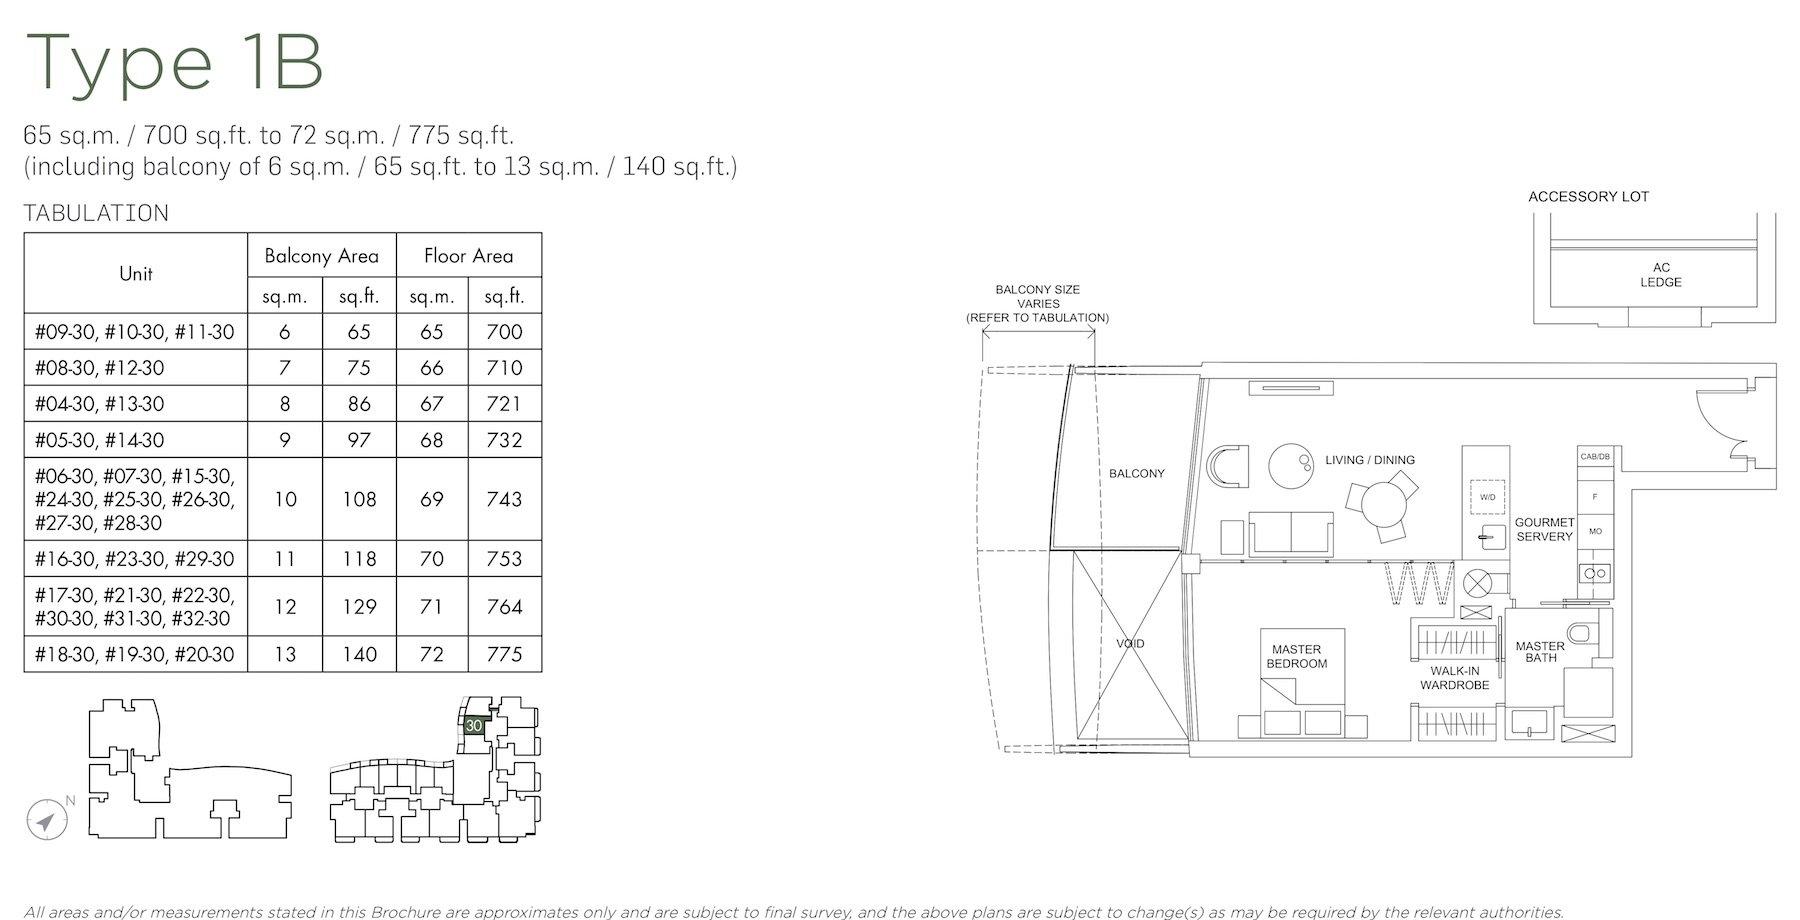 Marina One Residences 滨海盛景豪苑 floor plans 1 bedroom 1B